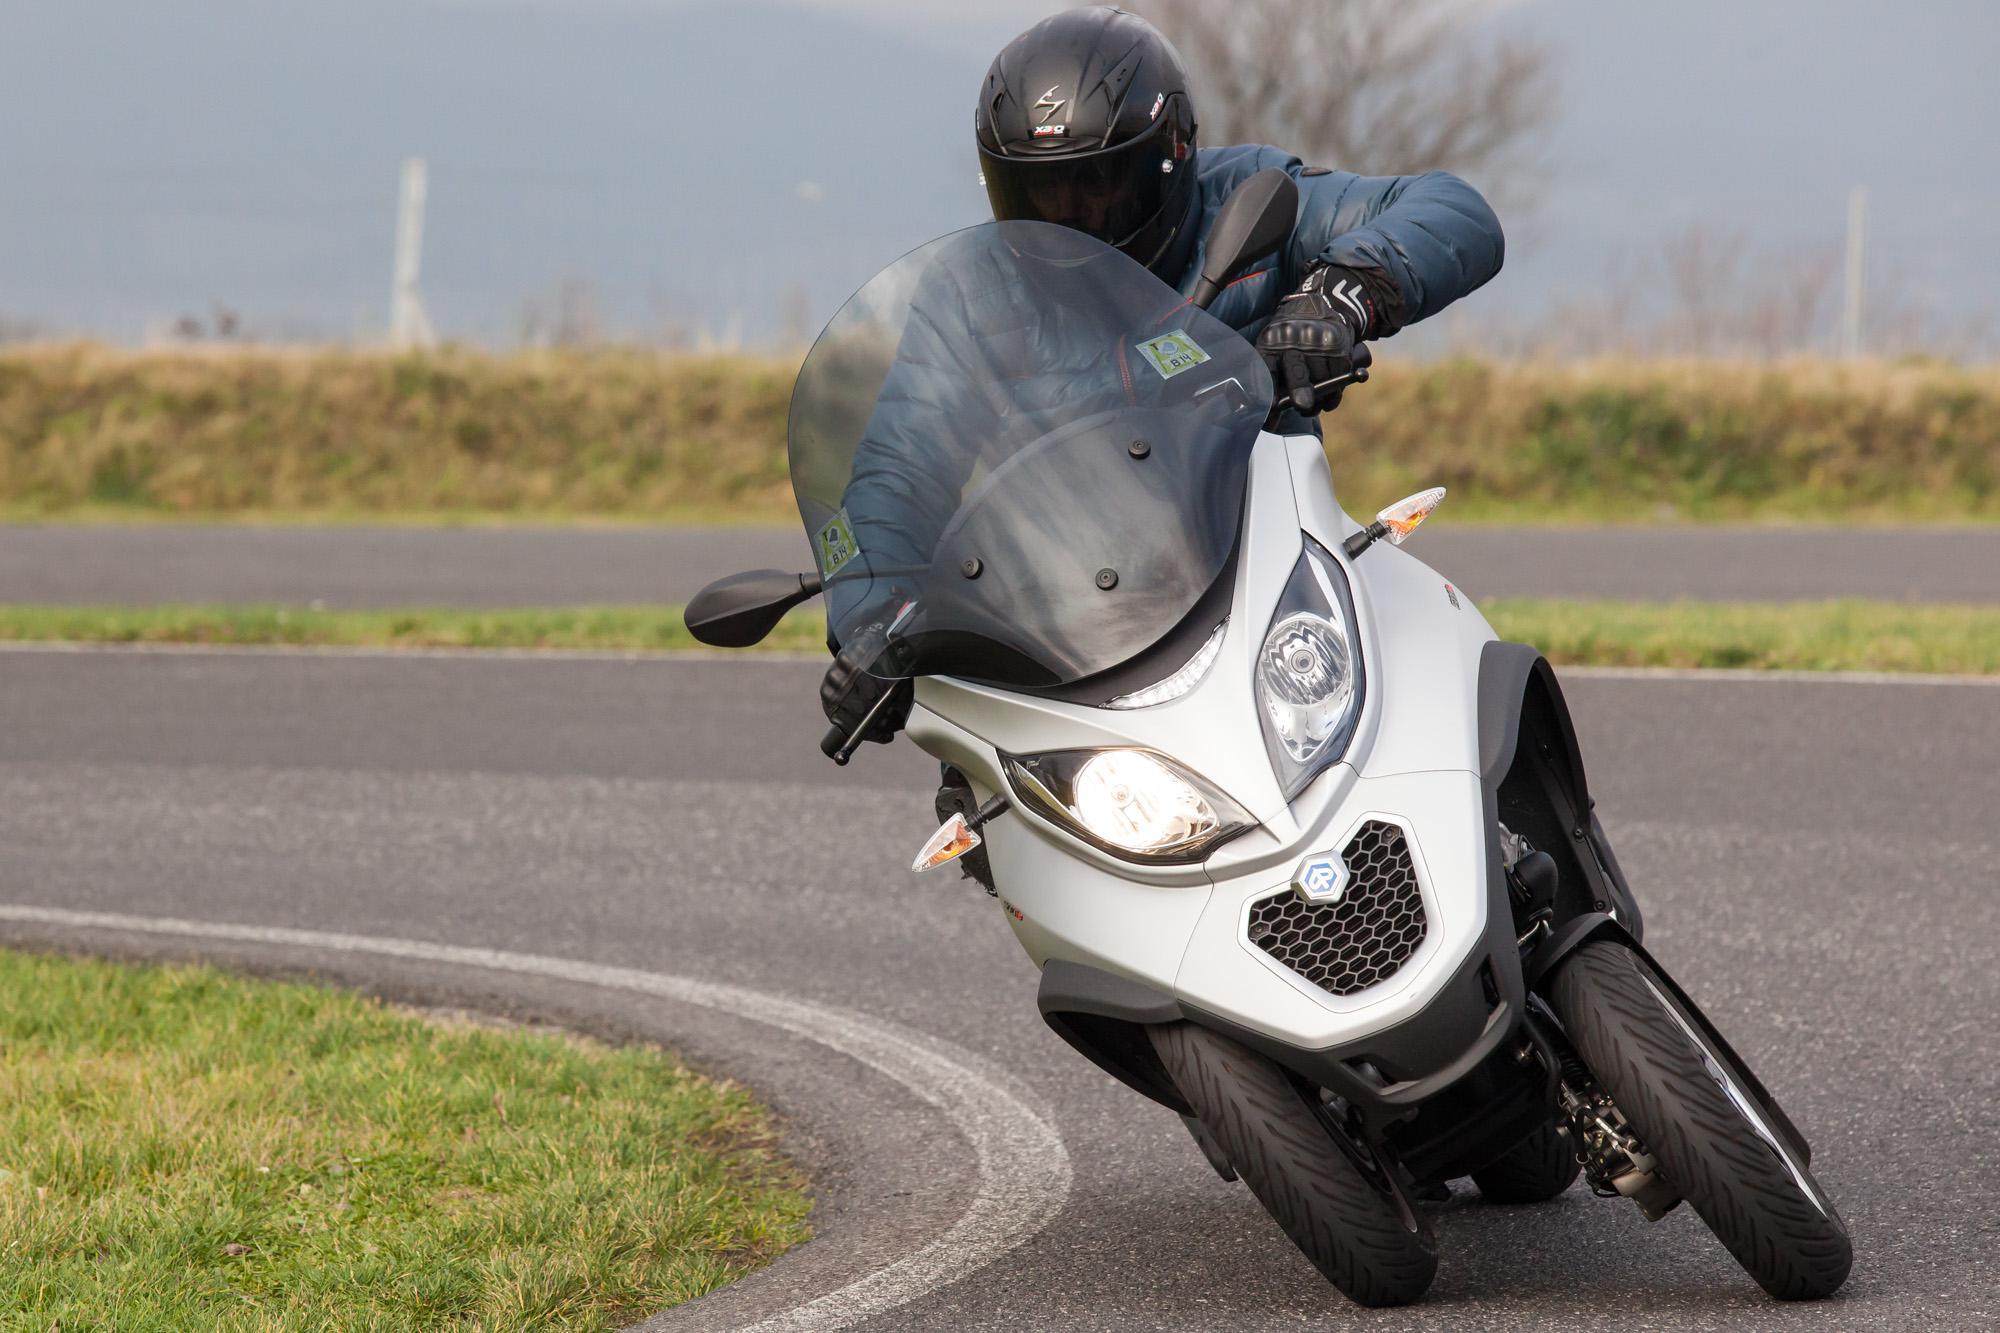 piaggio mp3 500ie lt sport test 2014 motorrad fotos motorrad bilder. Black Bedroom Furniture Sets. Home Design Ideas